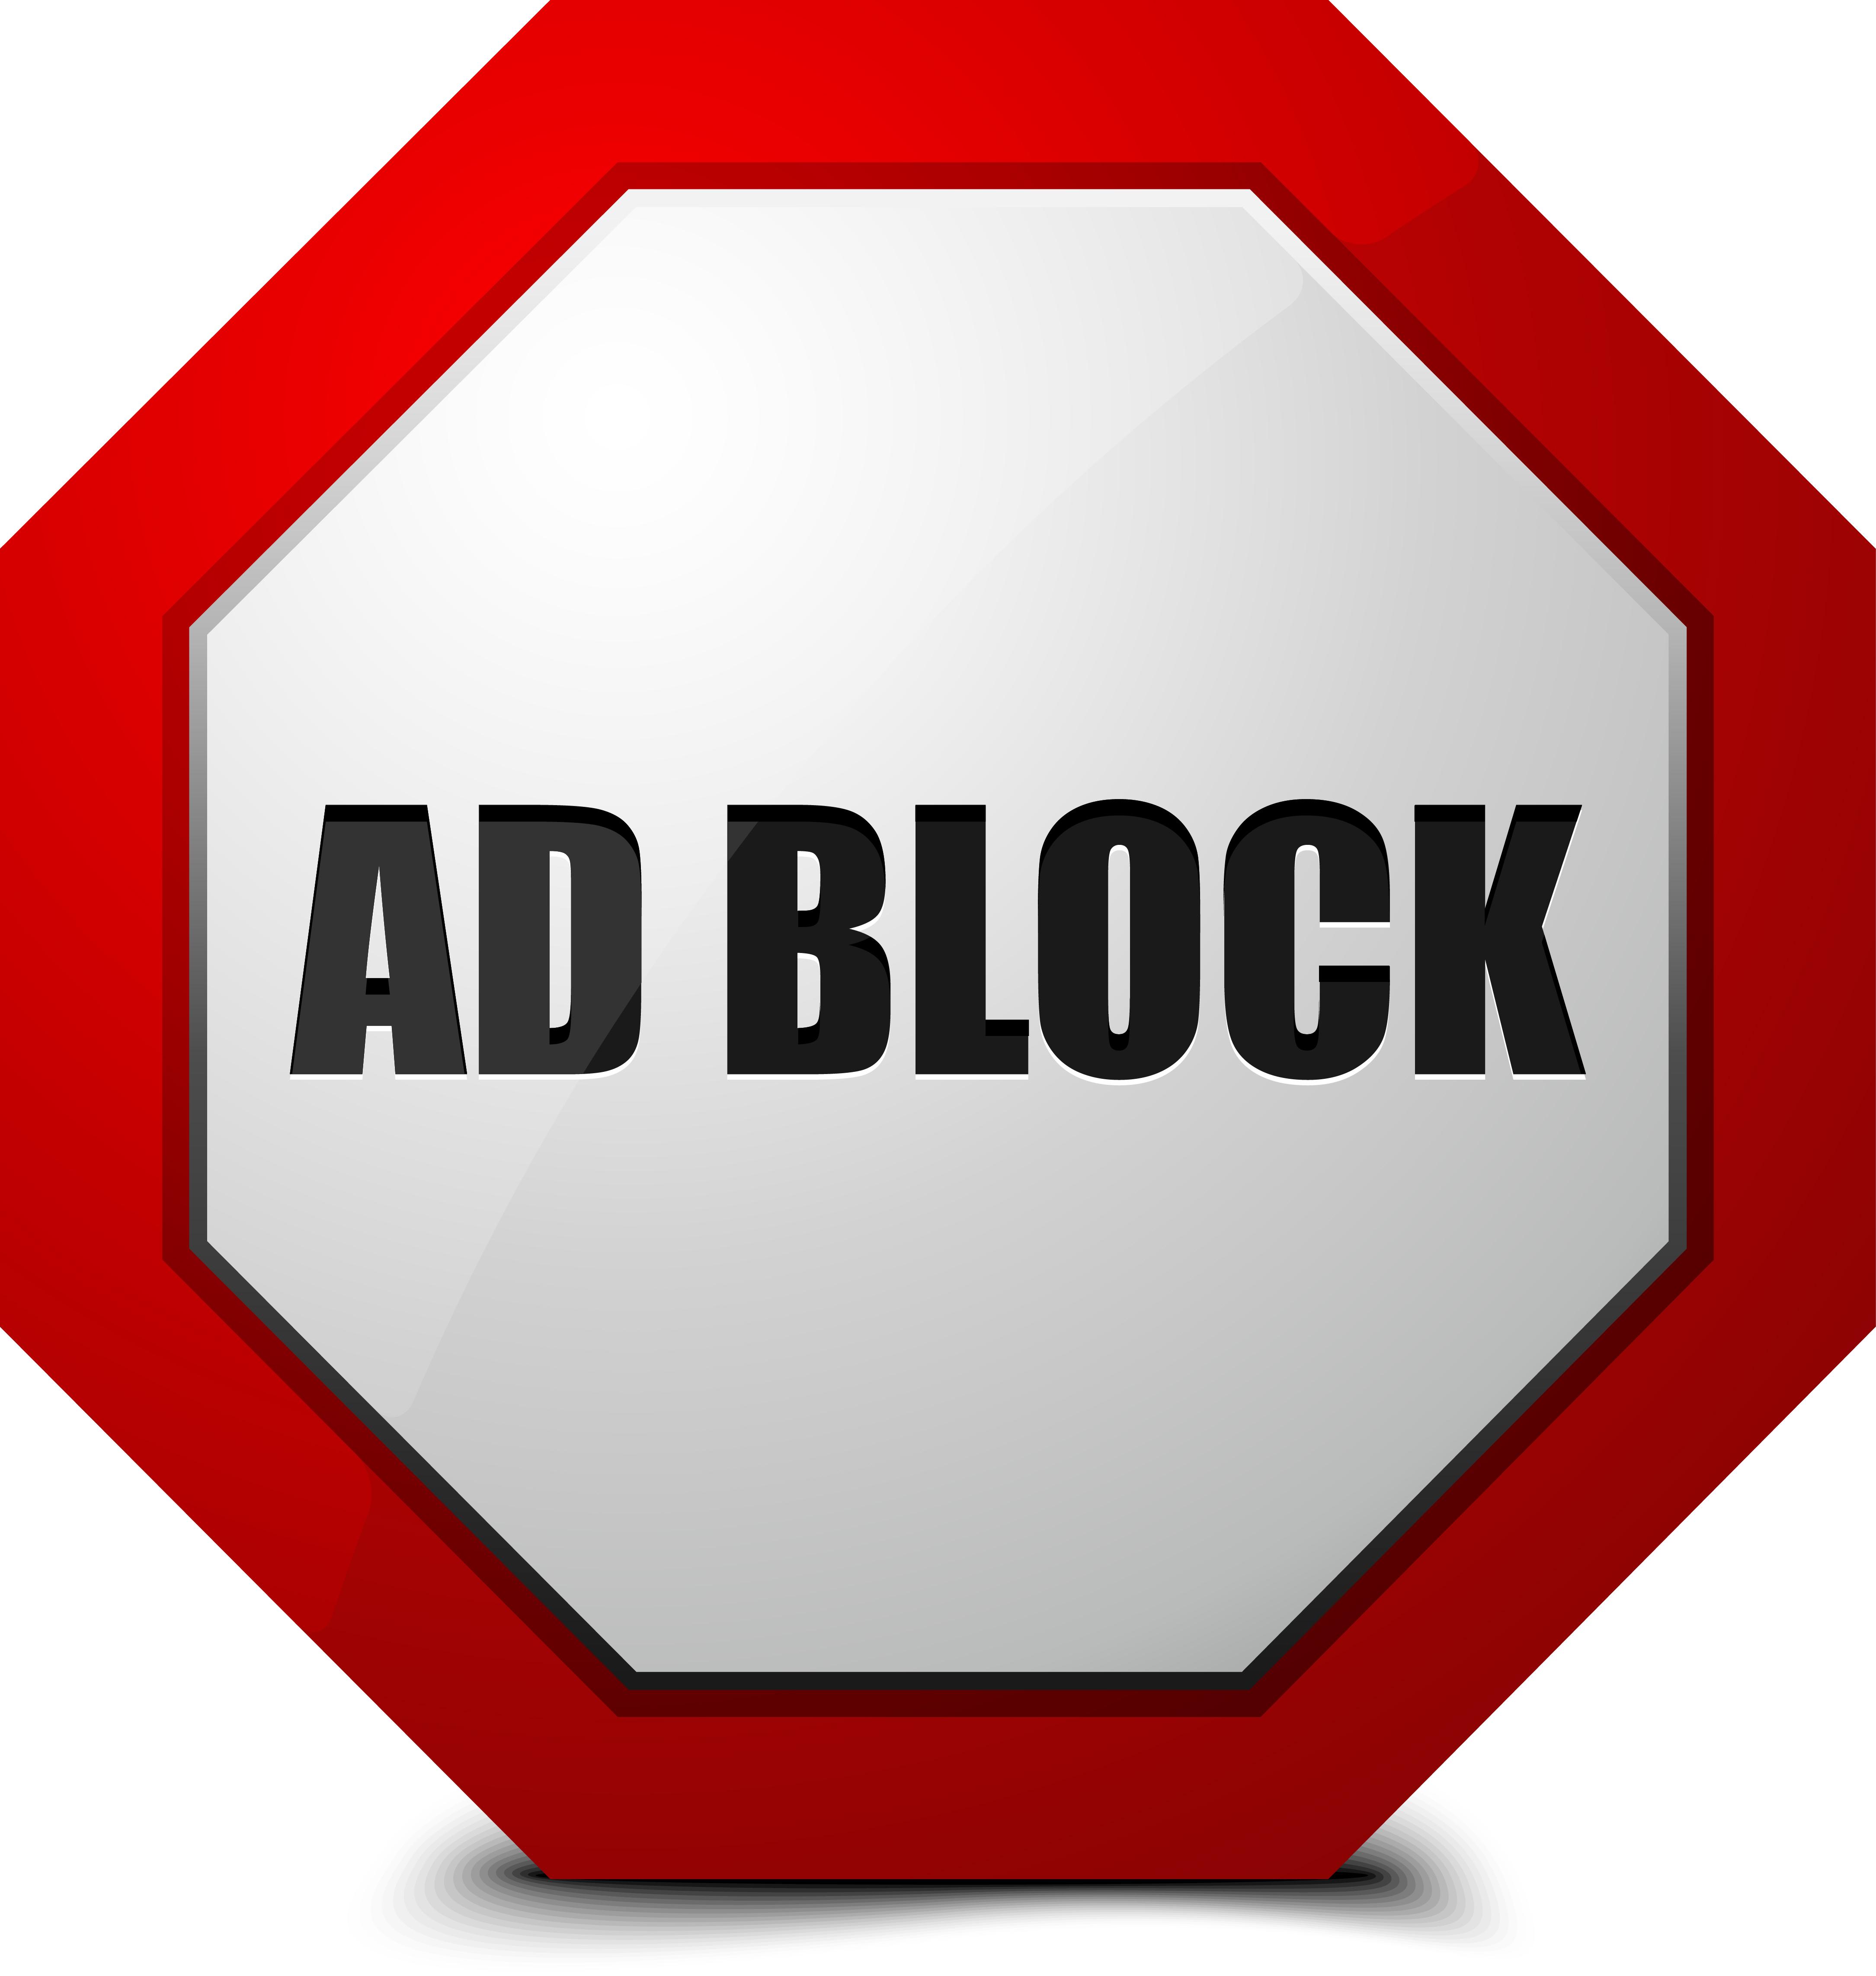 adbloker